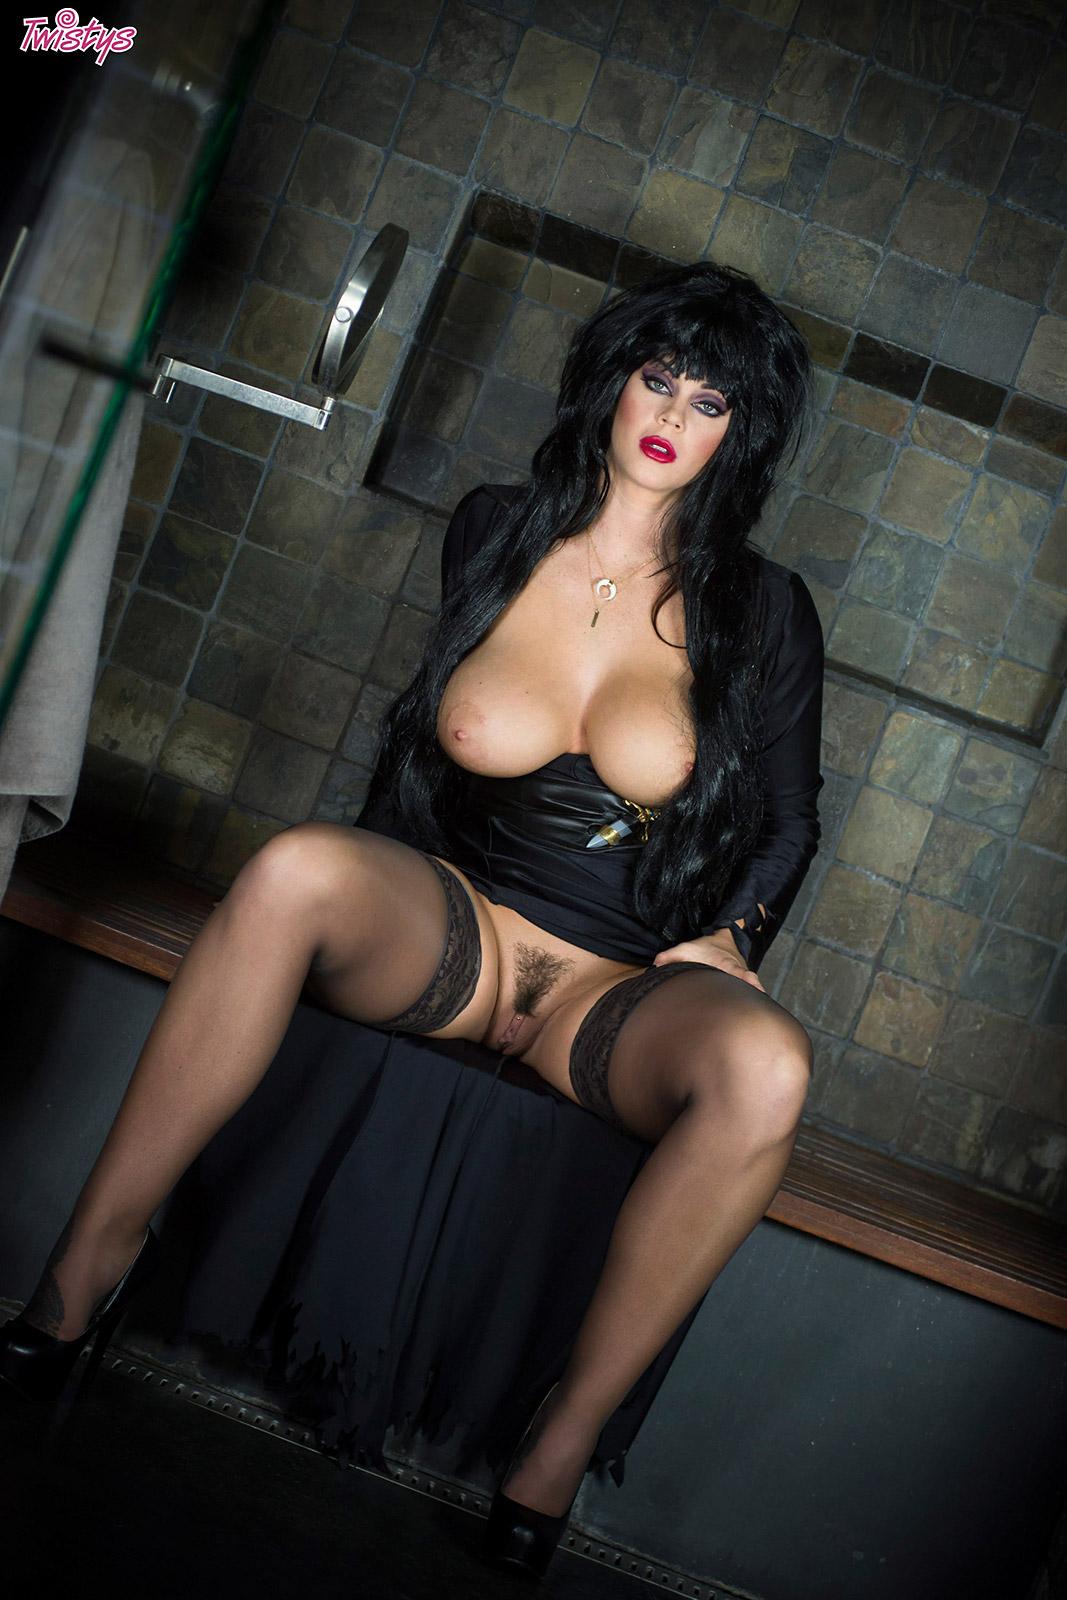 Alison Tyler Nude Pics alison tyler nude pictures. rating = 6.94/10